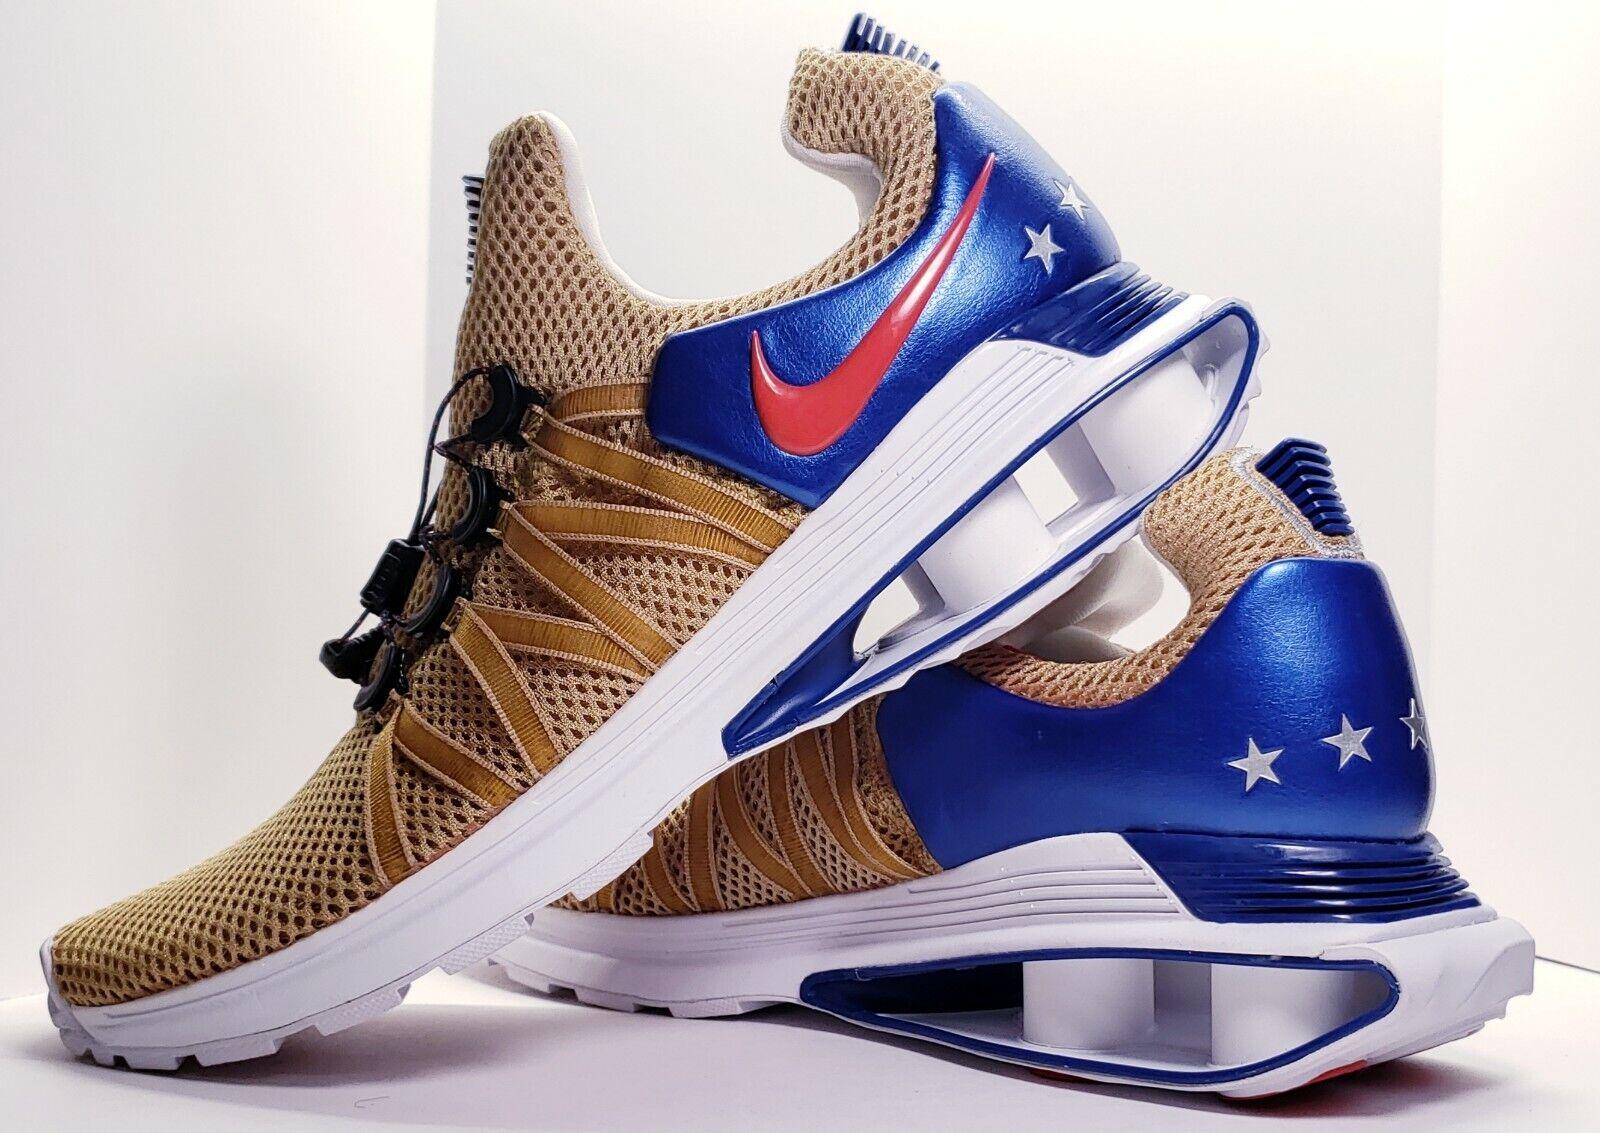 Nike Shox Gravity Mens AR1999-700 Metallic gold Red bluee Team USA Olympic Size11